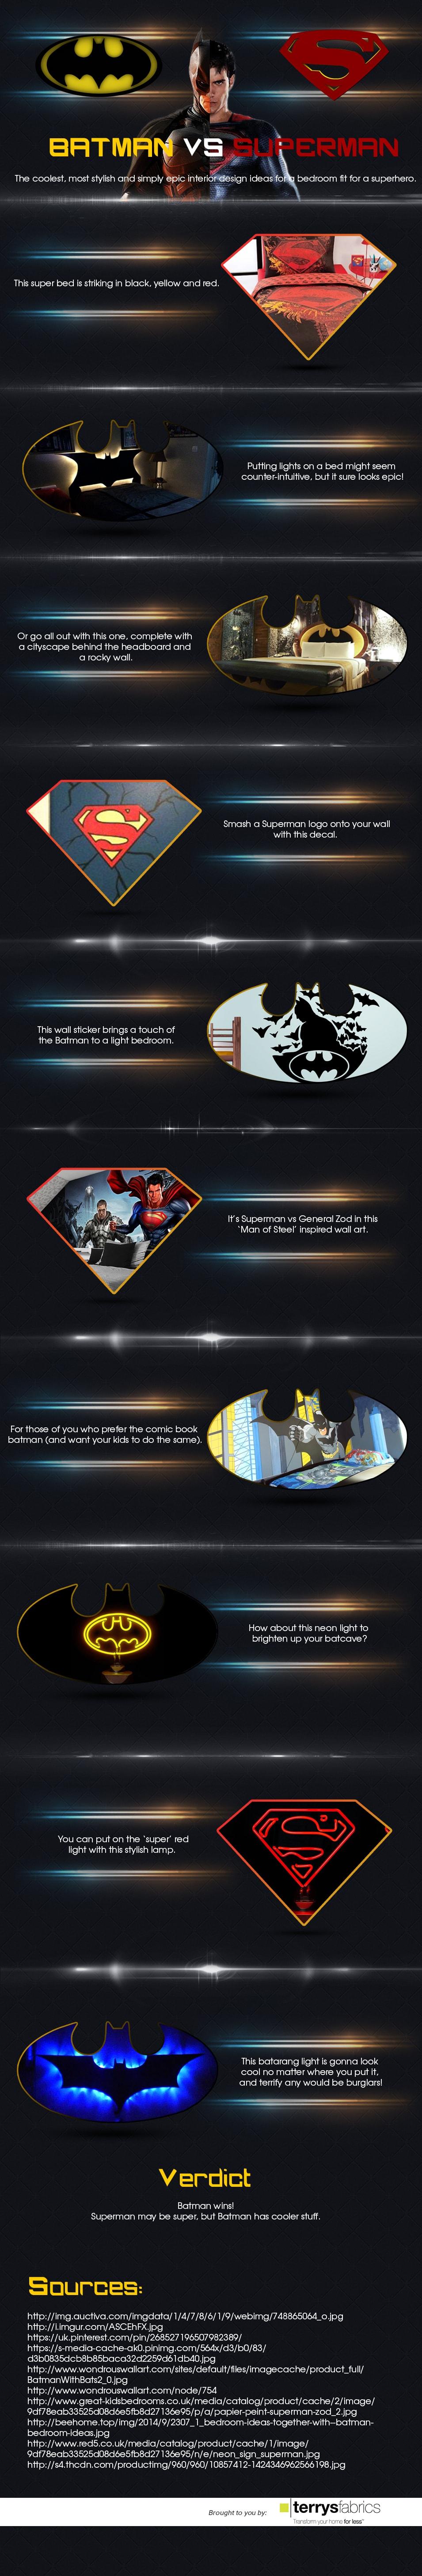 Battle of the Bedrooms: Batman vs. Superman [Infographic]